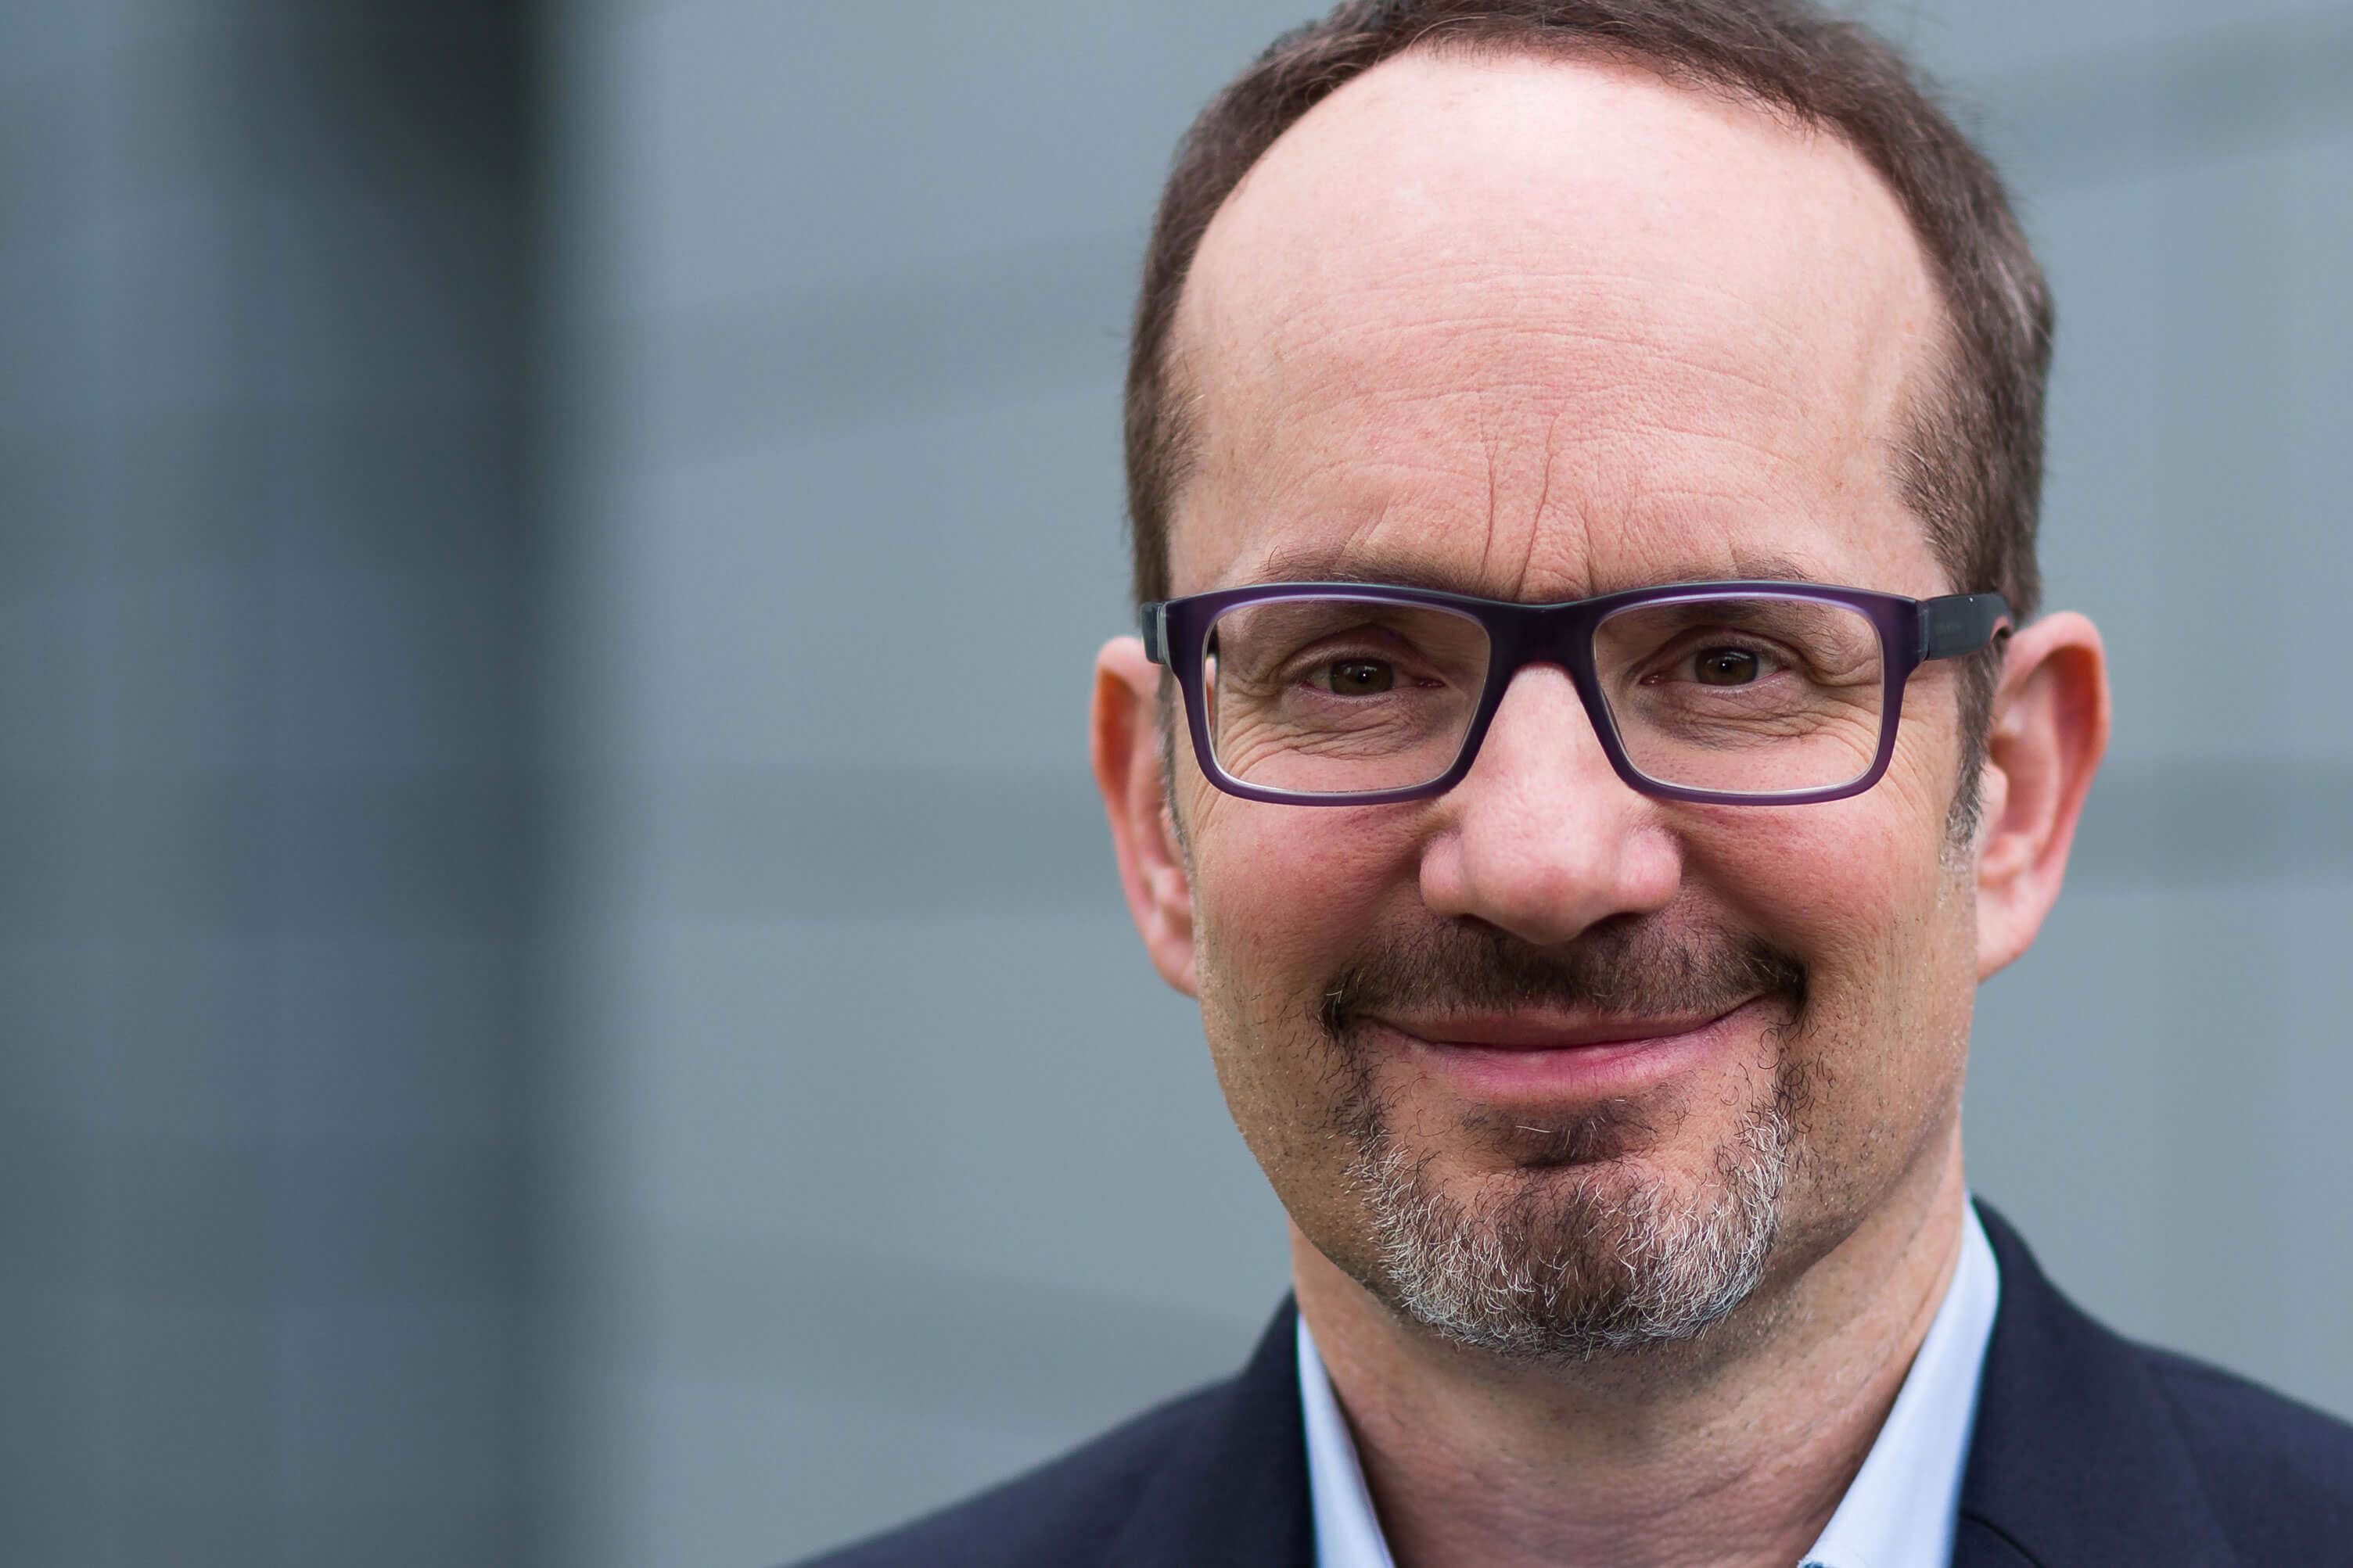 Tony Hyman ist Preisträger der Carl Zeiss Lecture 2019